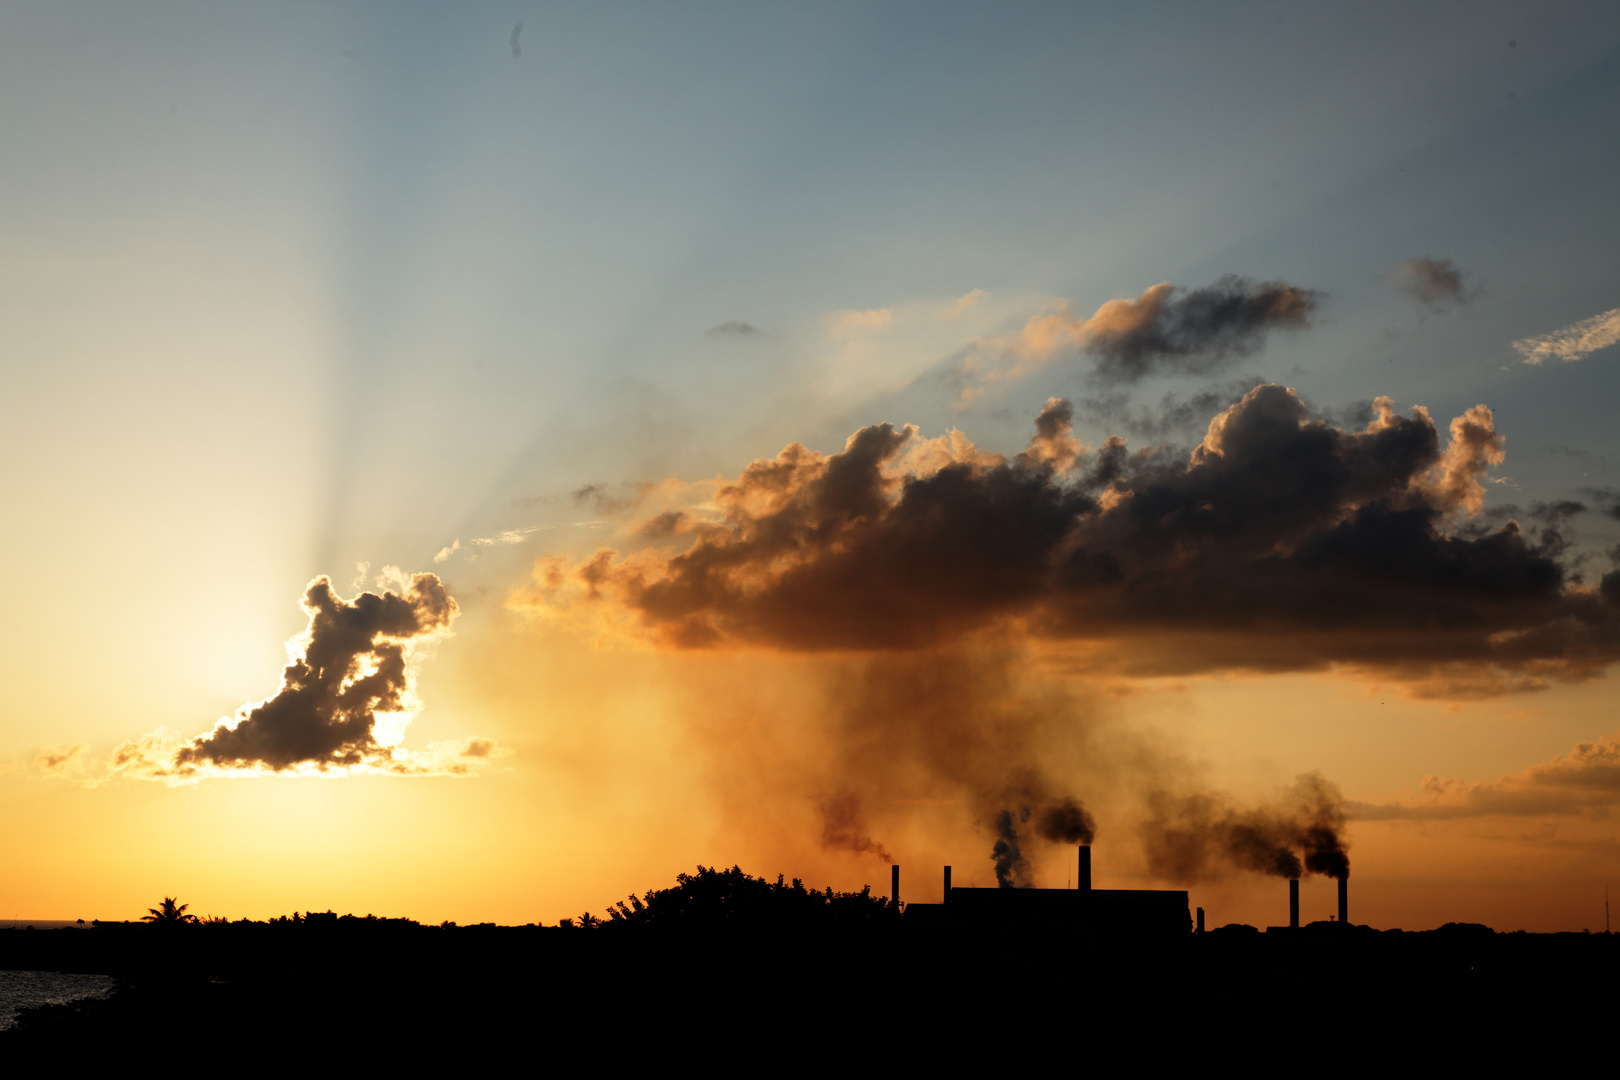 Sonnenuntergang mit Zuckerrohrfabrik